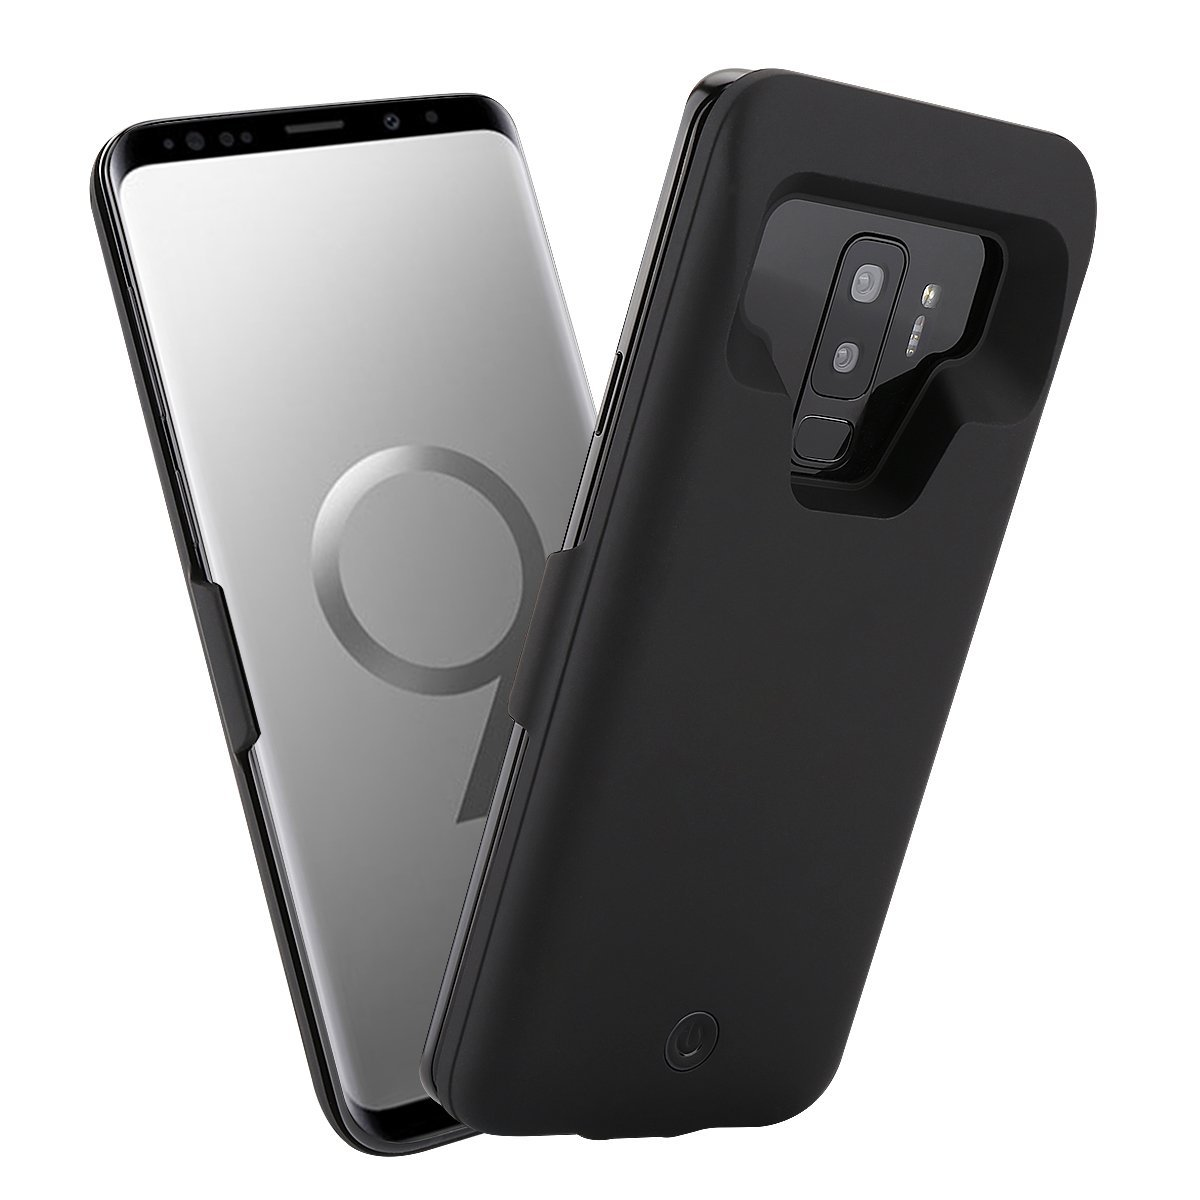 online store 57ffe de475 Cheap 2018 Battery, find 2018 Battery deals on line at Alibaba.com